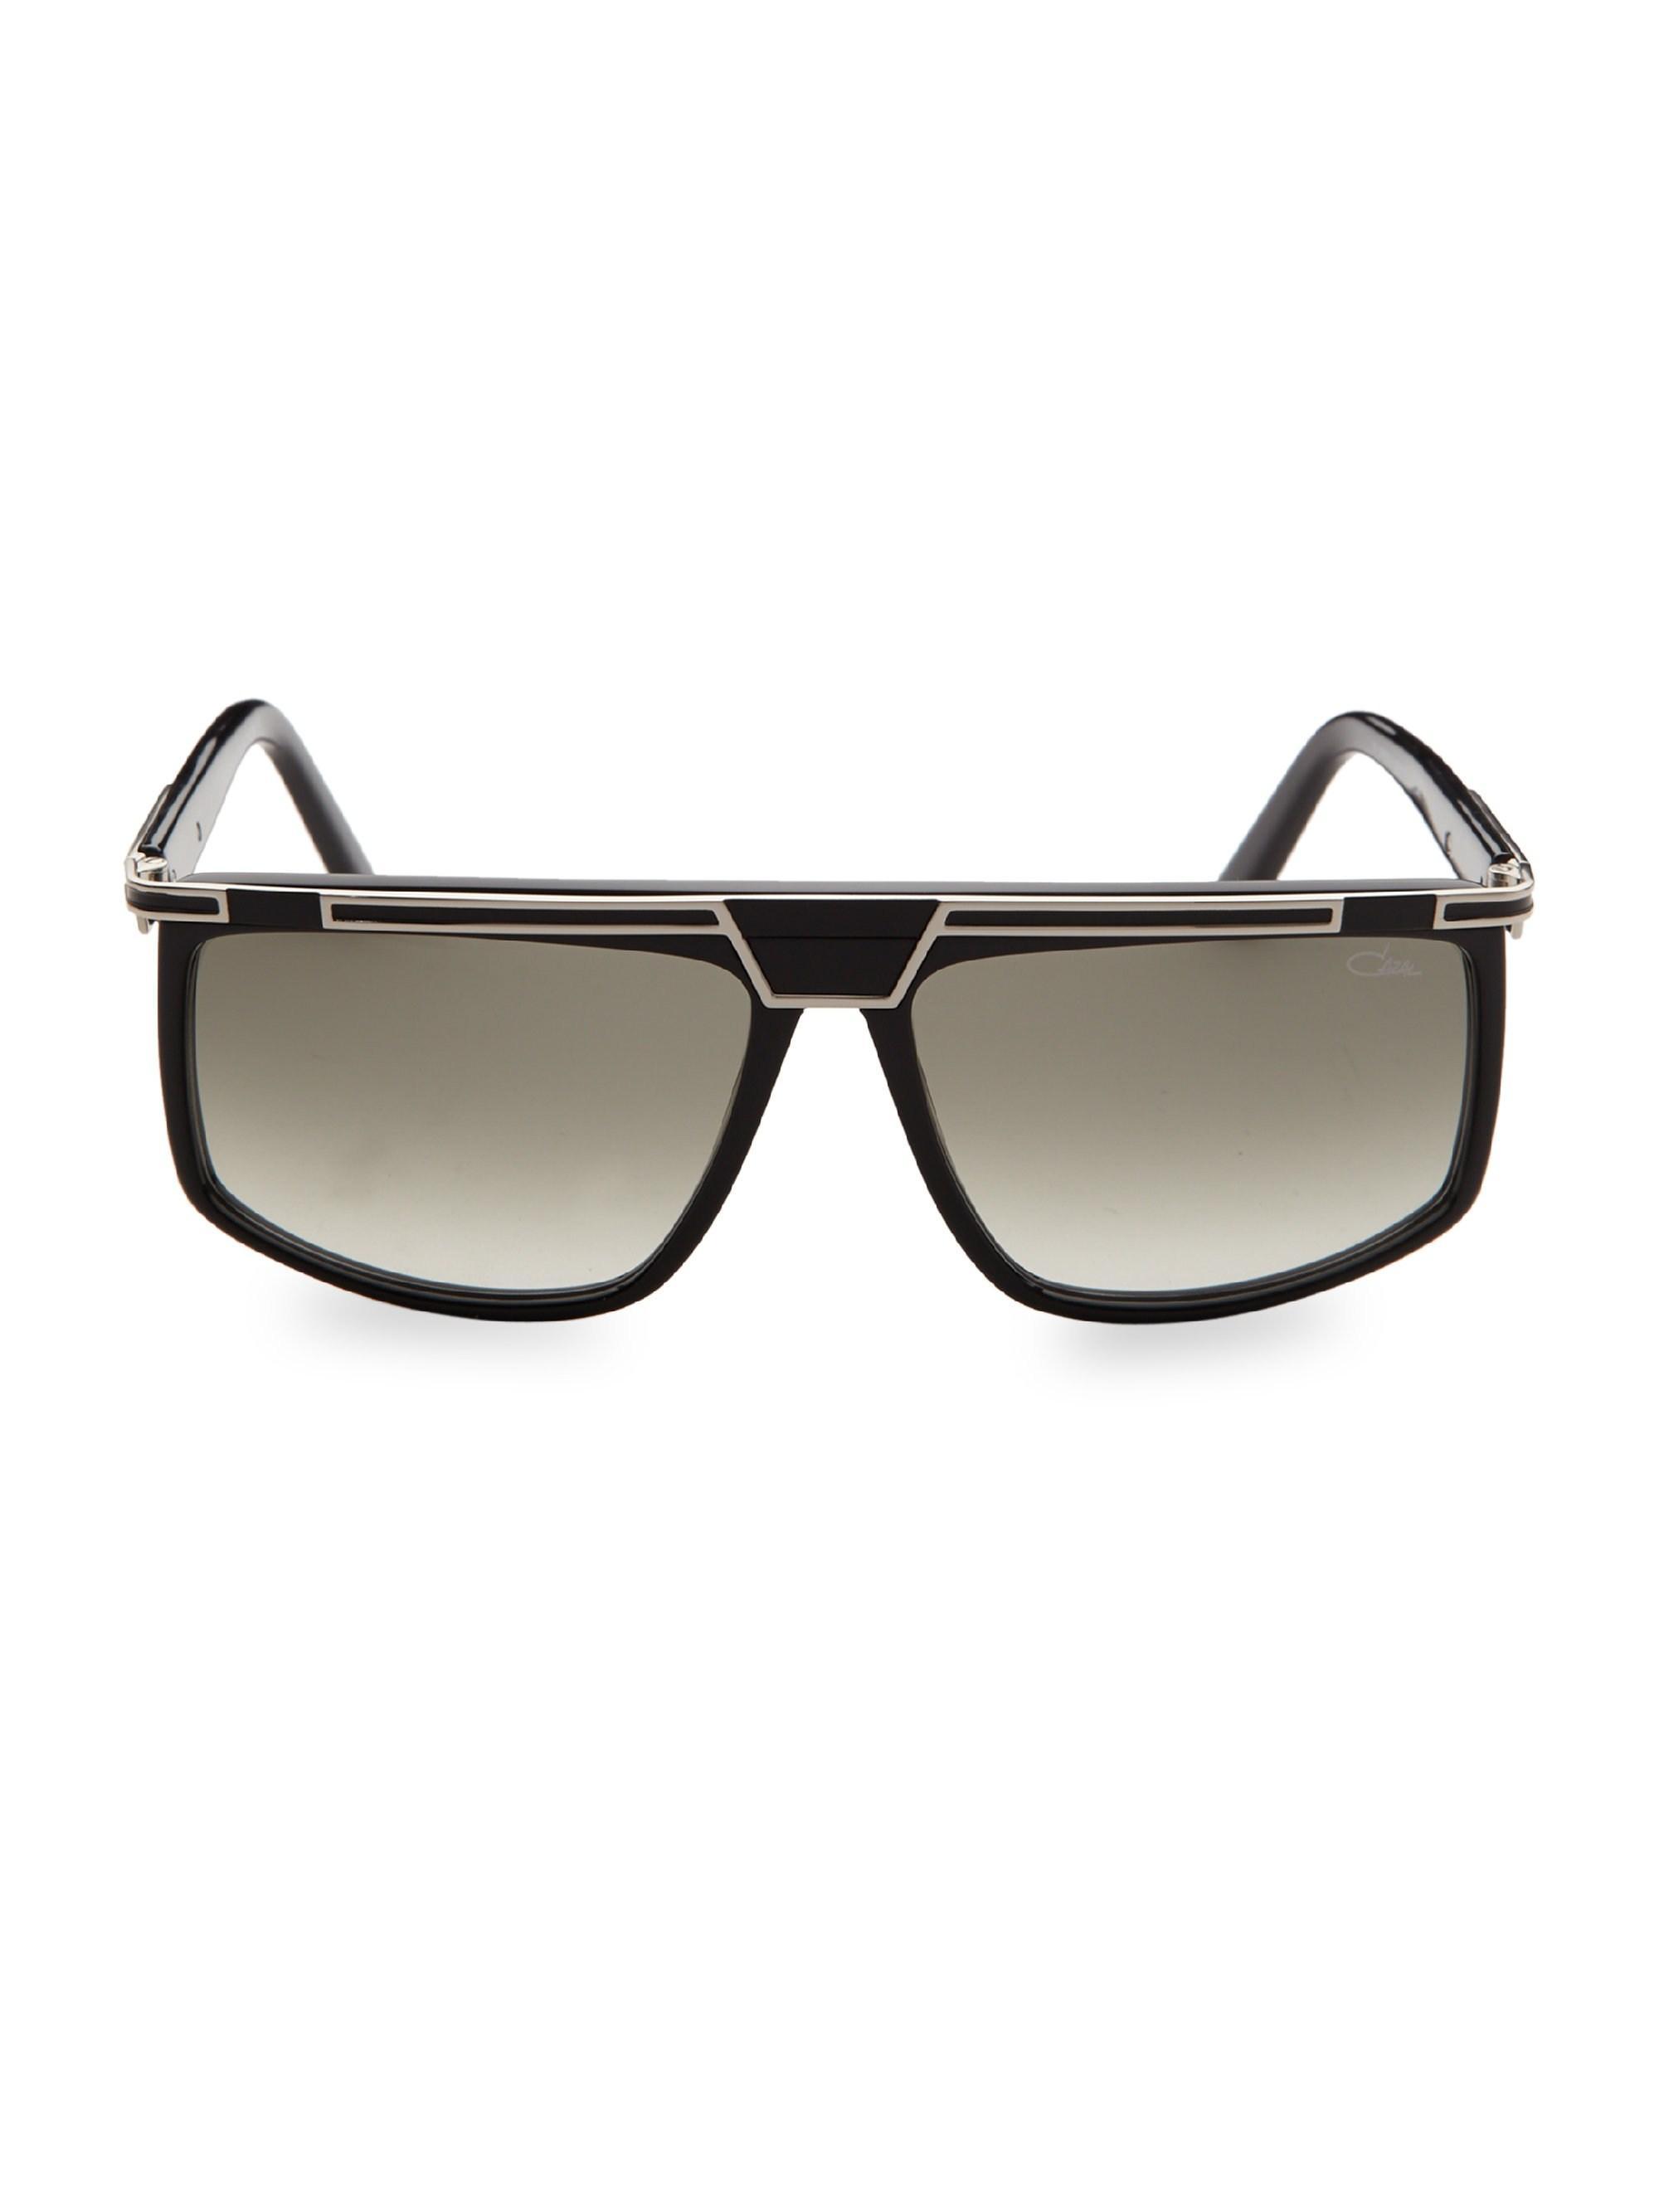 42c6572f812 Lyst - Cazal Oversized Bar-top Sunglasses in Metallic